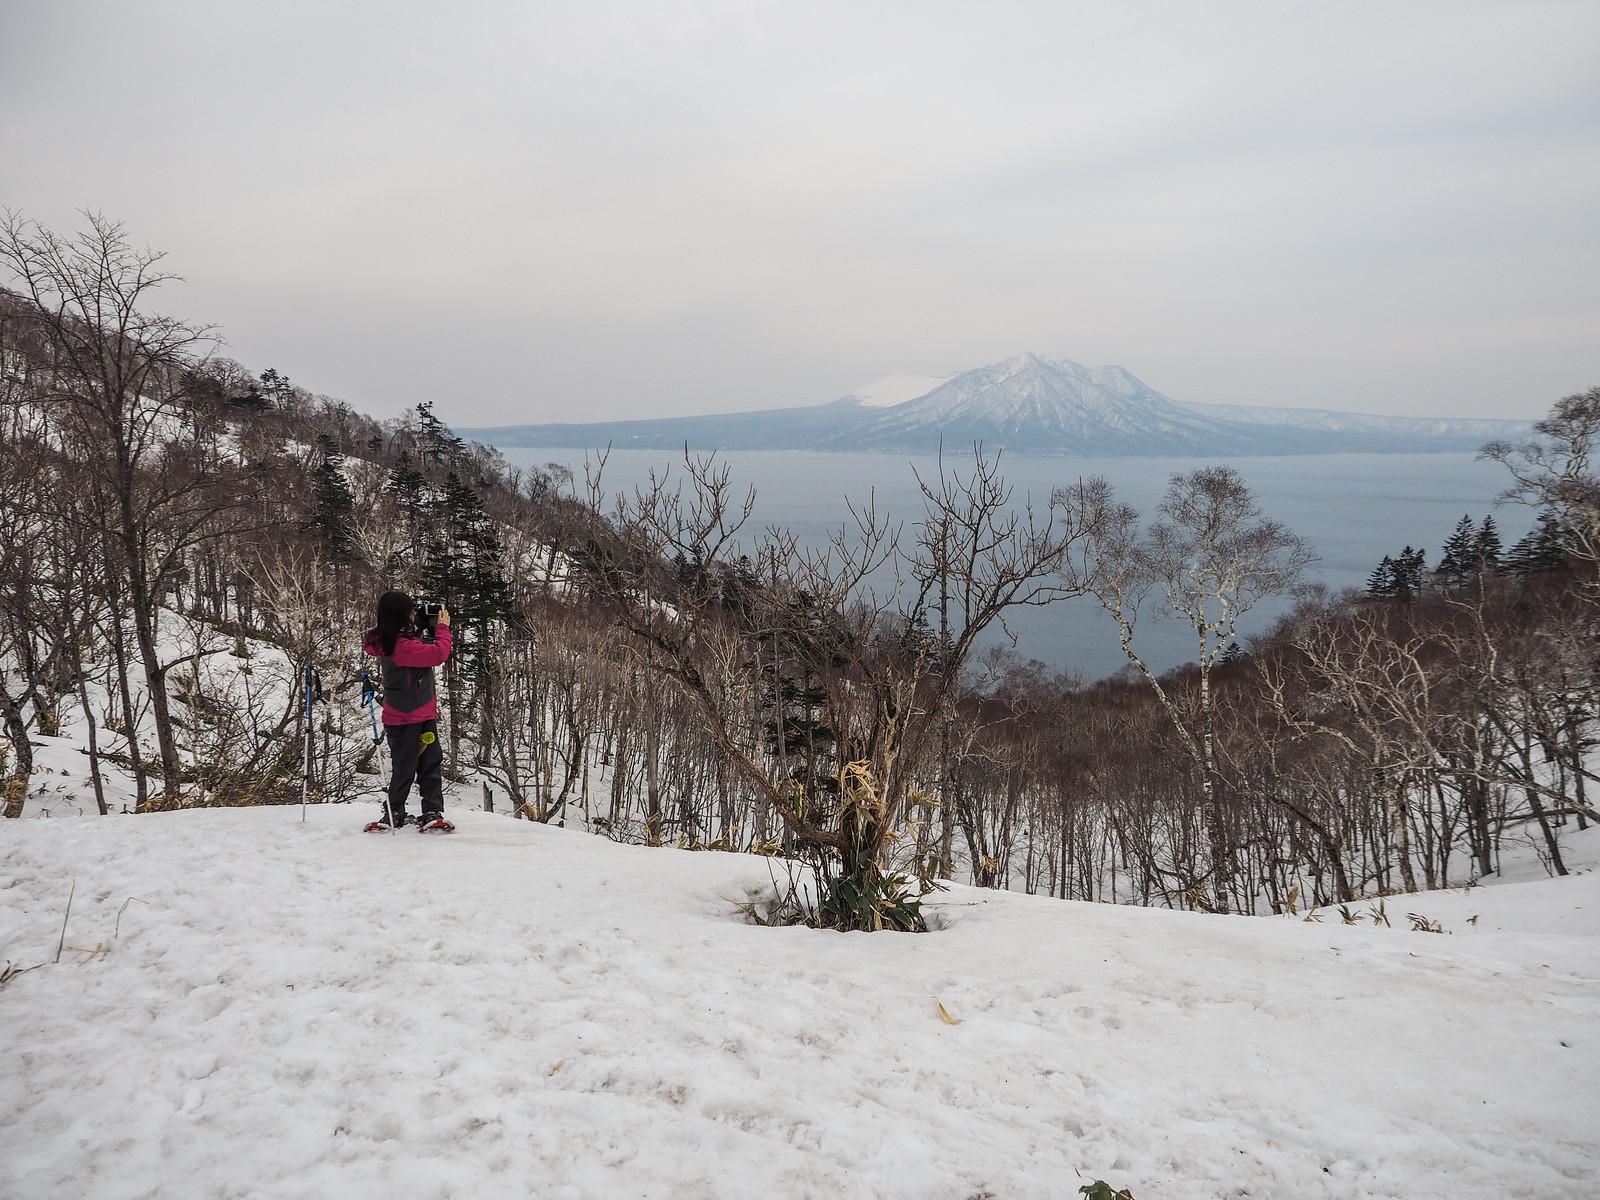 Mt. Ichankoppe ski touring and winter camping (Hokkaido, Japan)